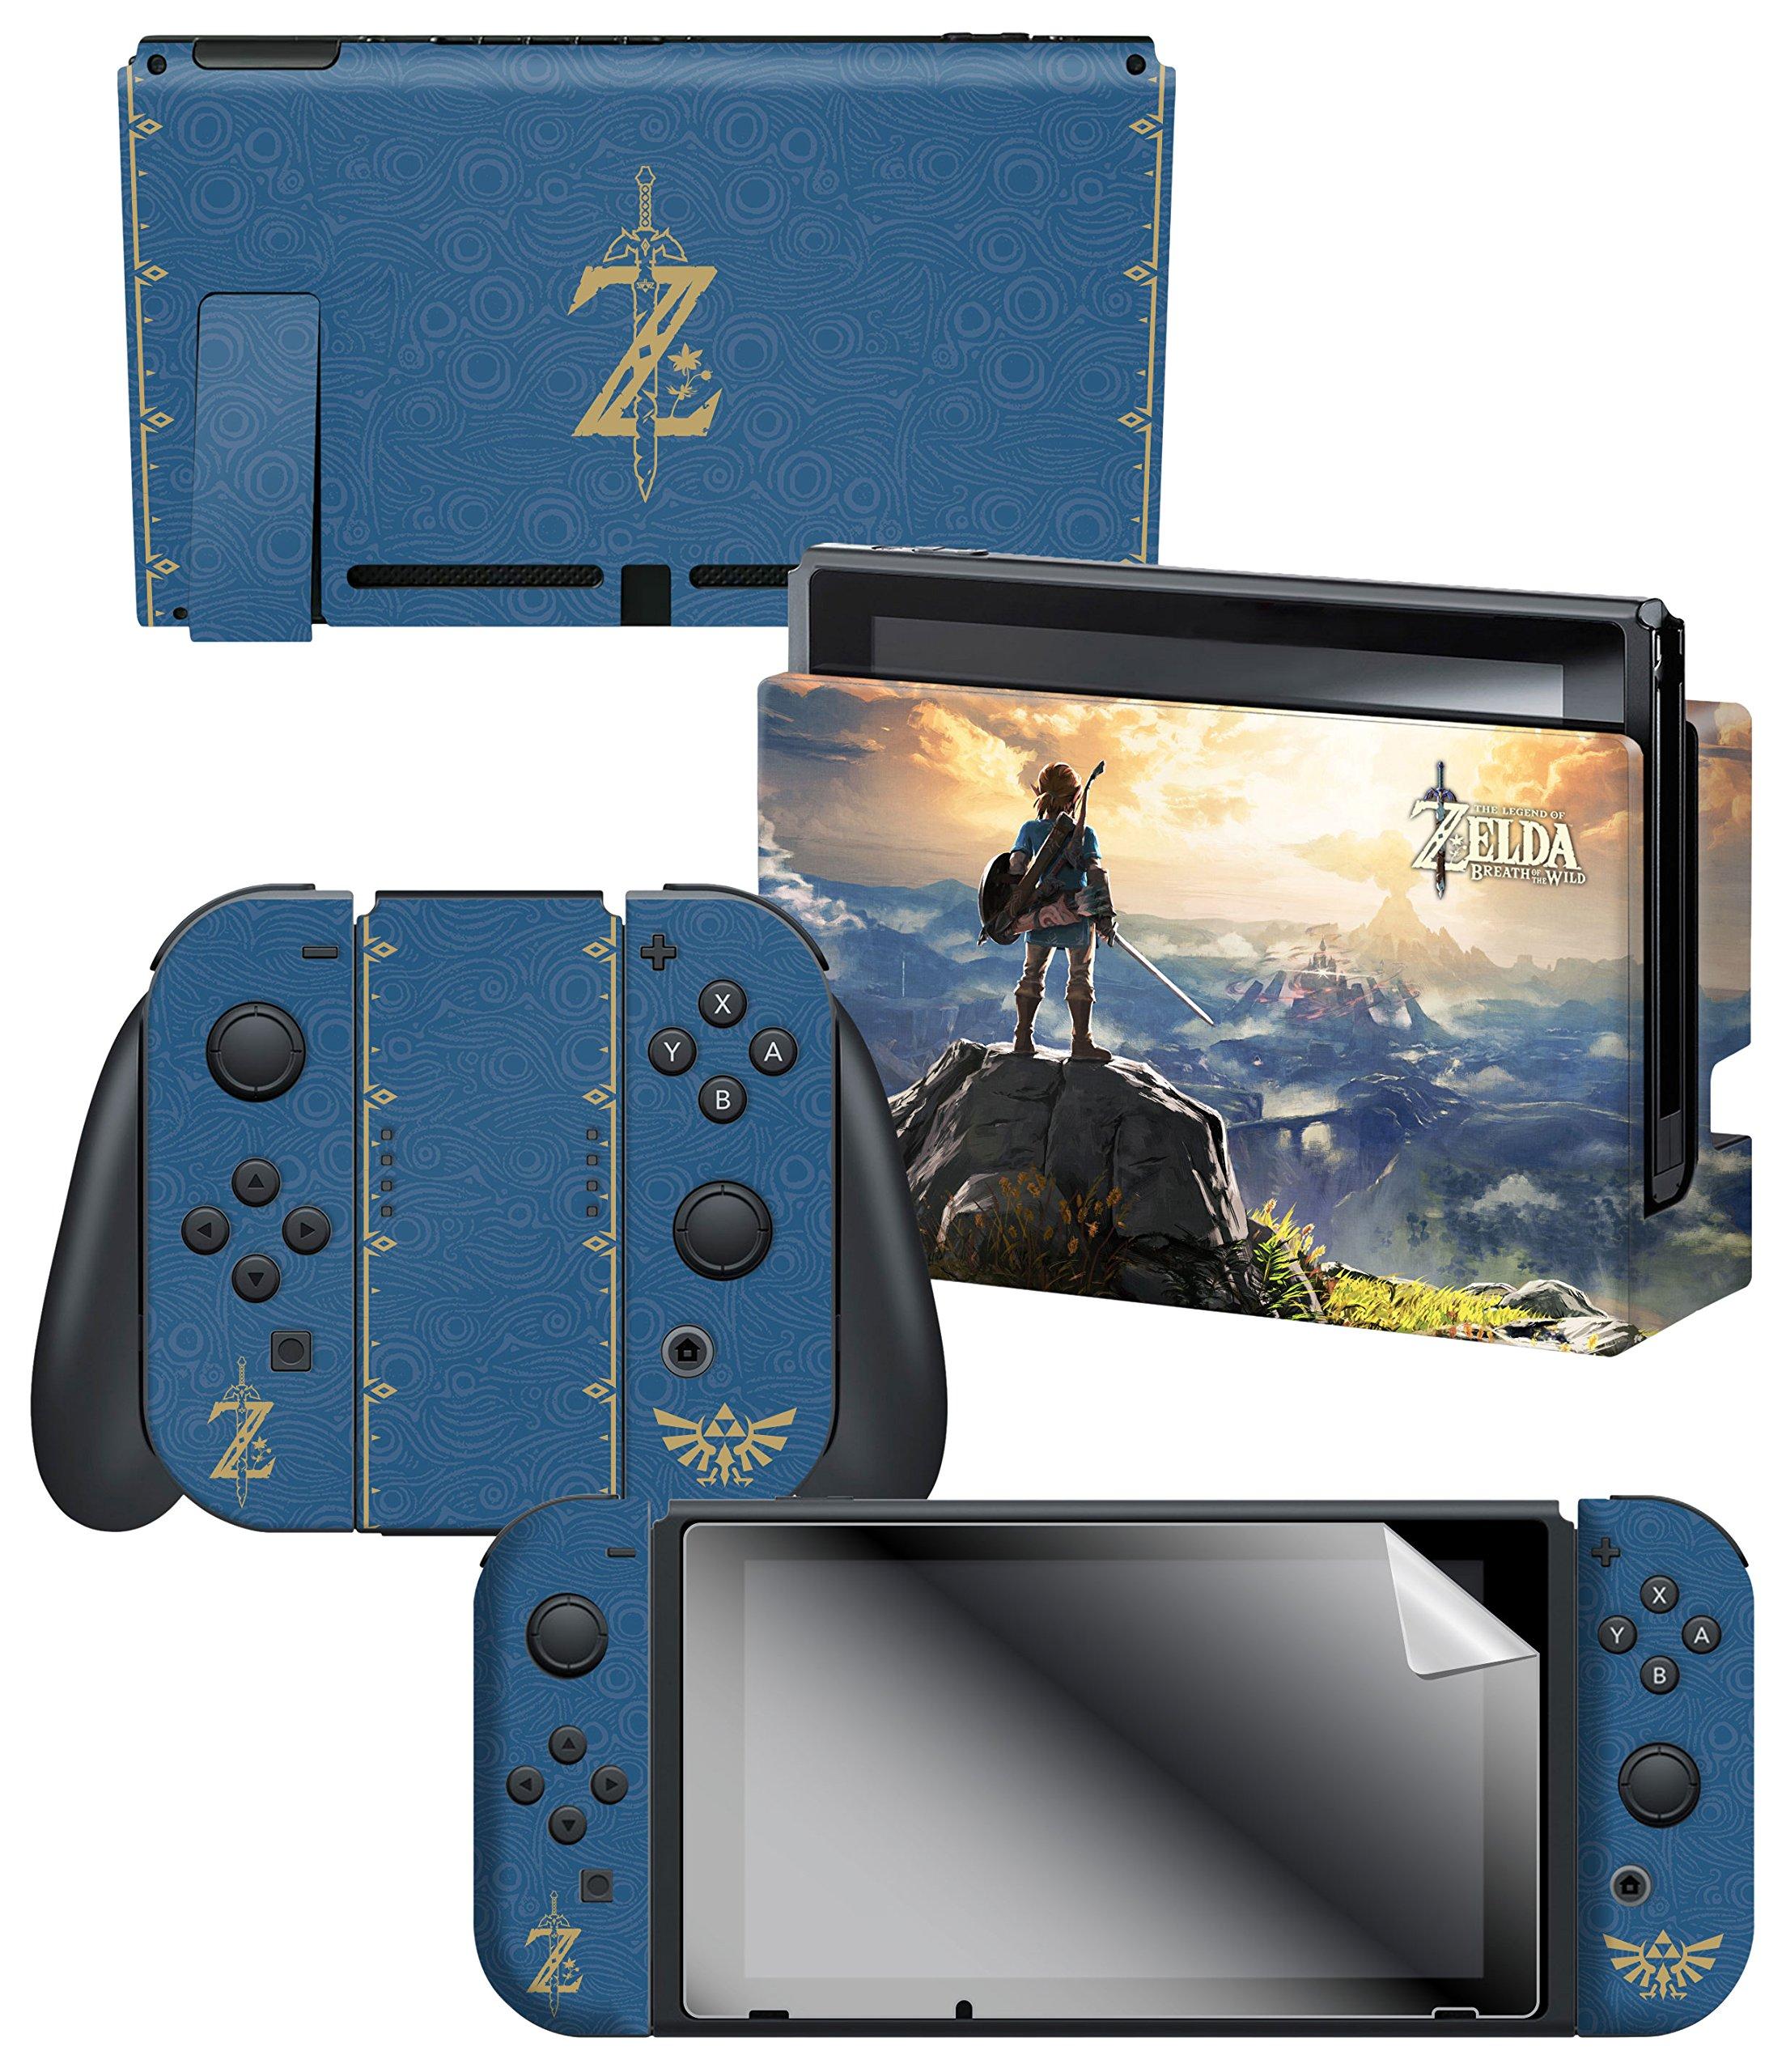 Controller Gear Nintendo Switch Skin   Screen Protector Set ... 46ad4f8302a92